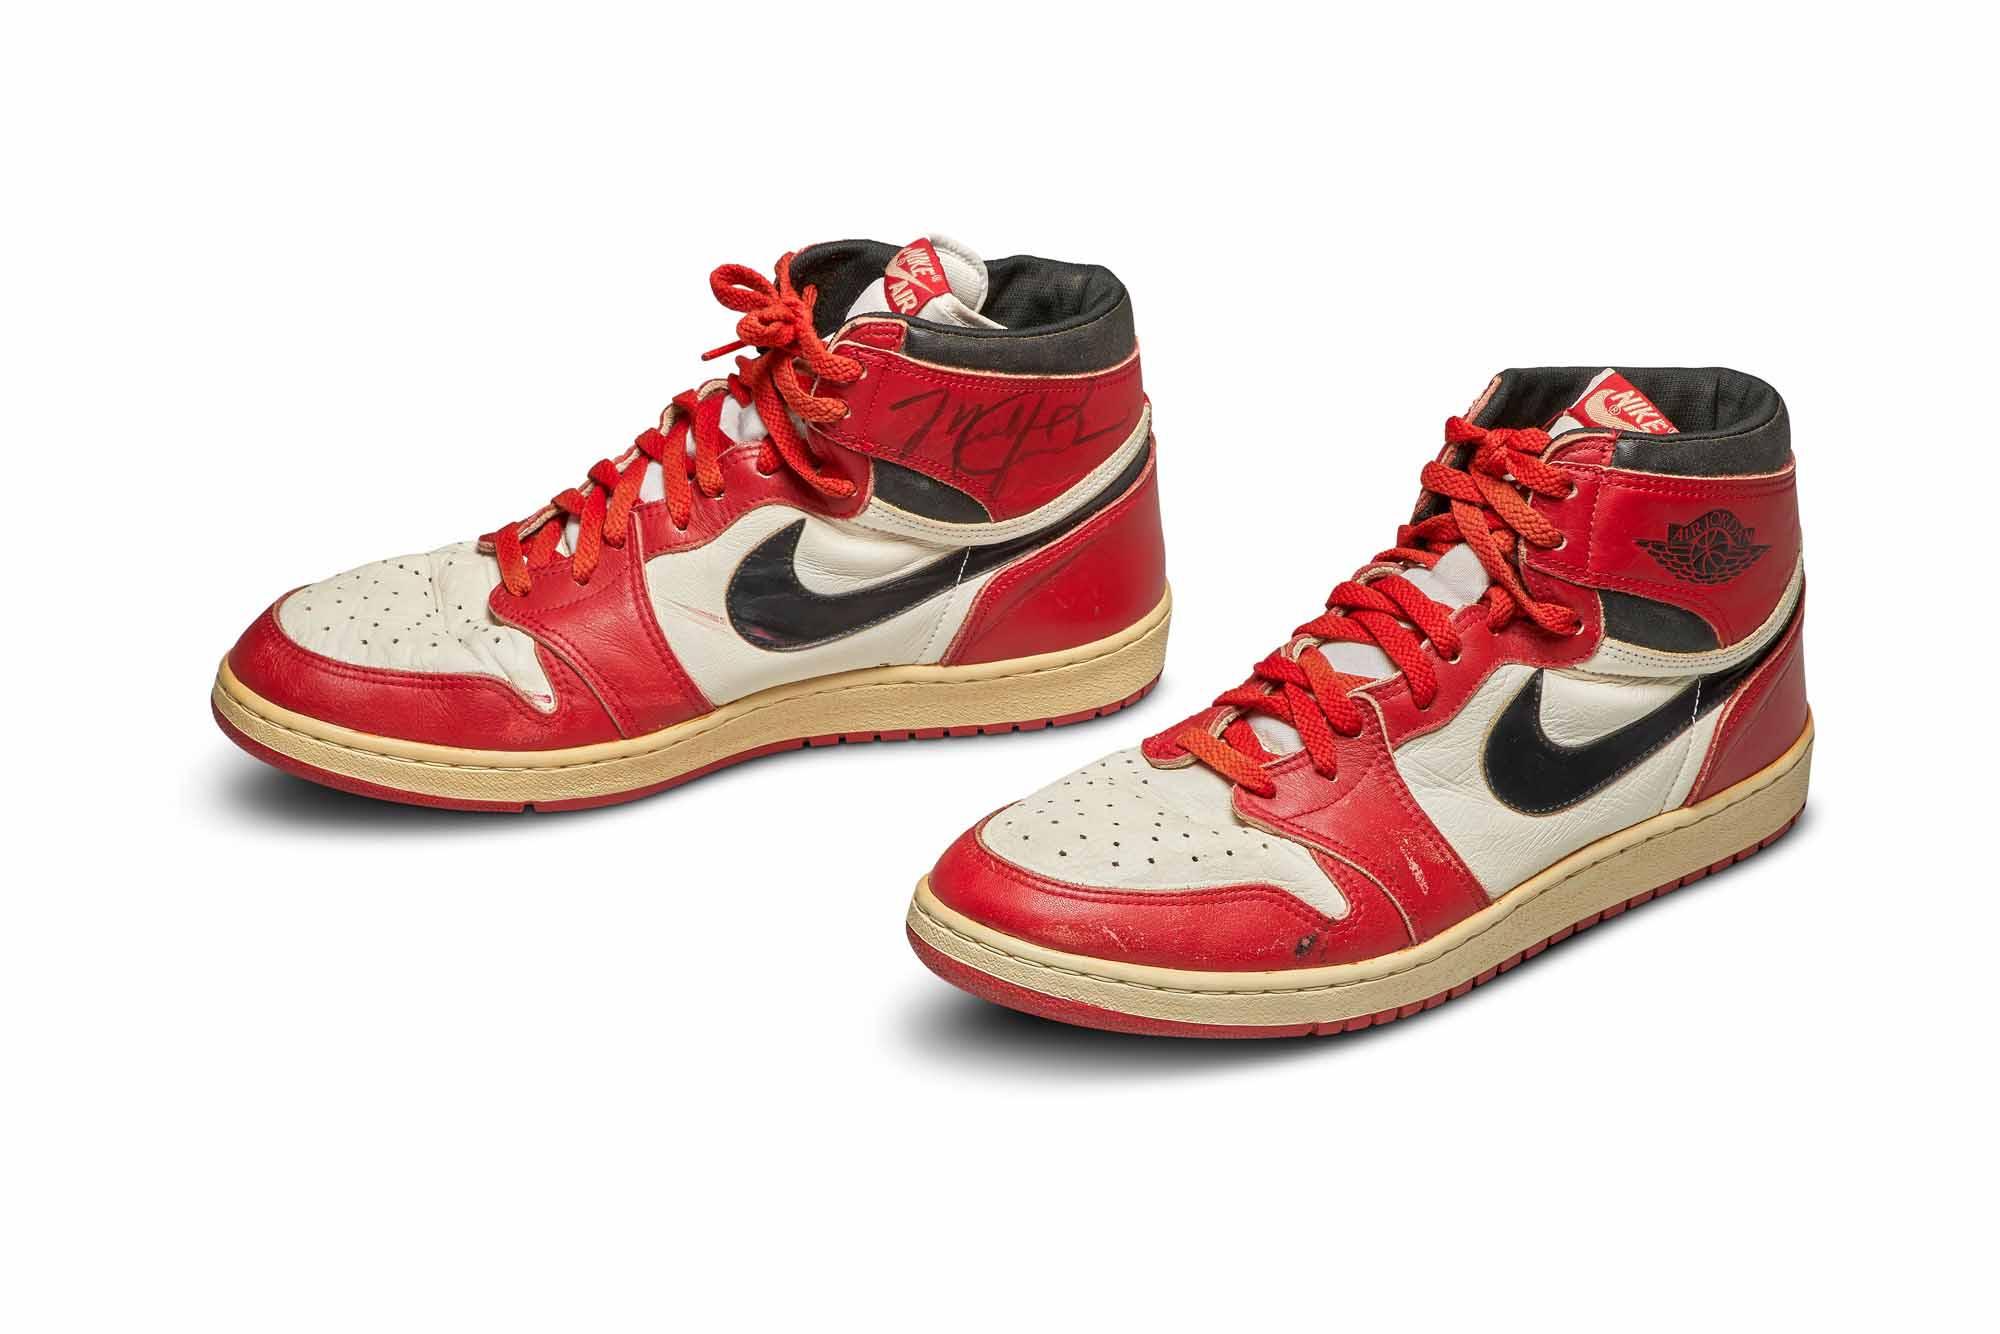 Michael Jordan's signature Air Jordan shoes from 1985 going up for ...